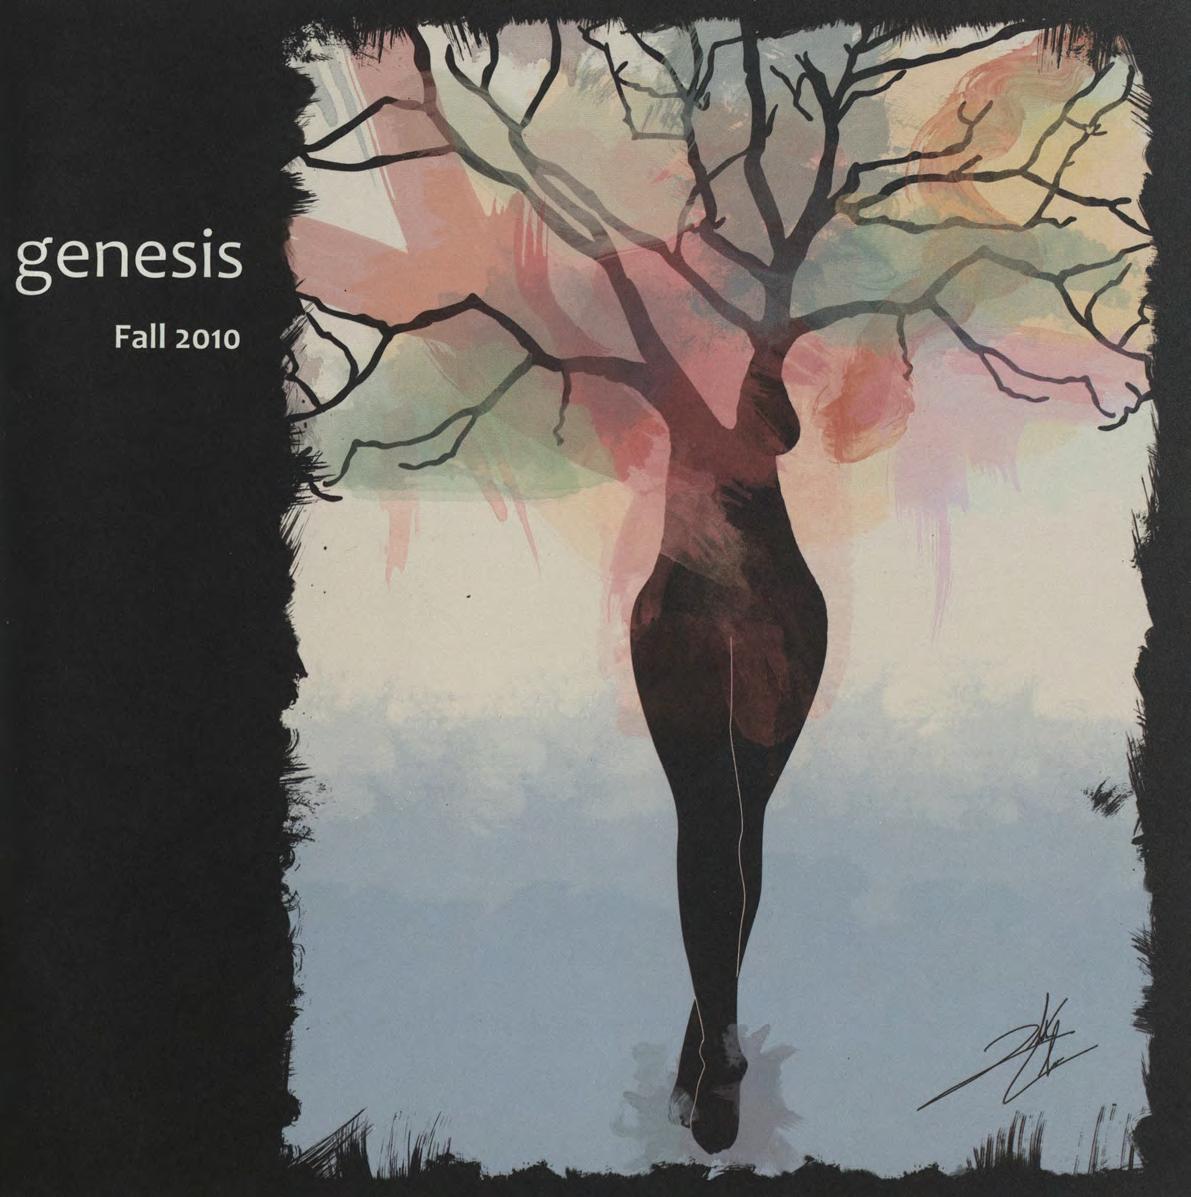 genesis fall 2010 cover